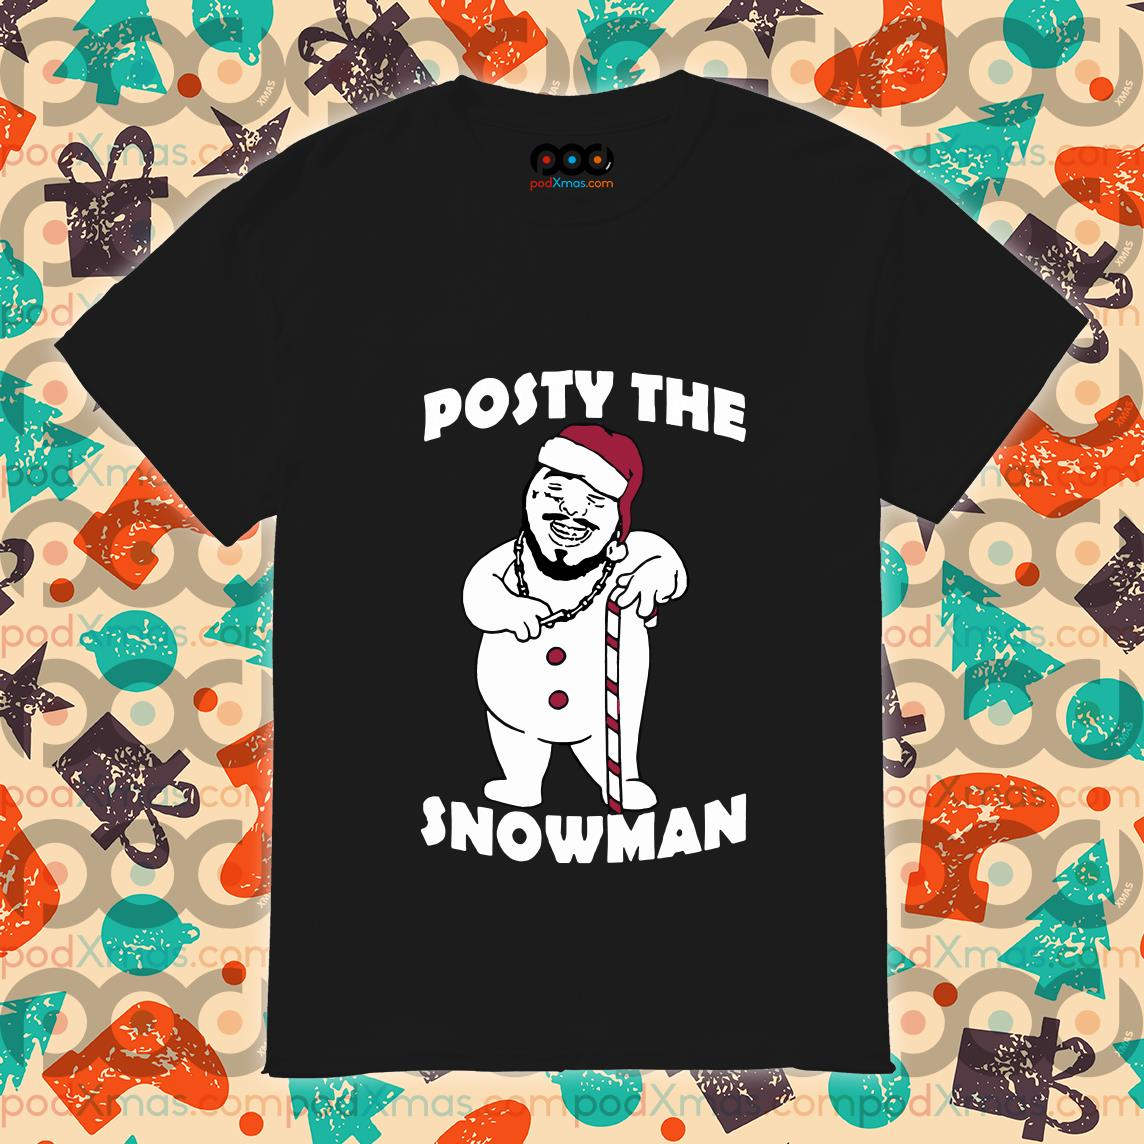 Posty the snowman Post Malone funny Santa Claus shirt